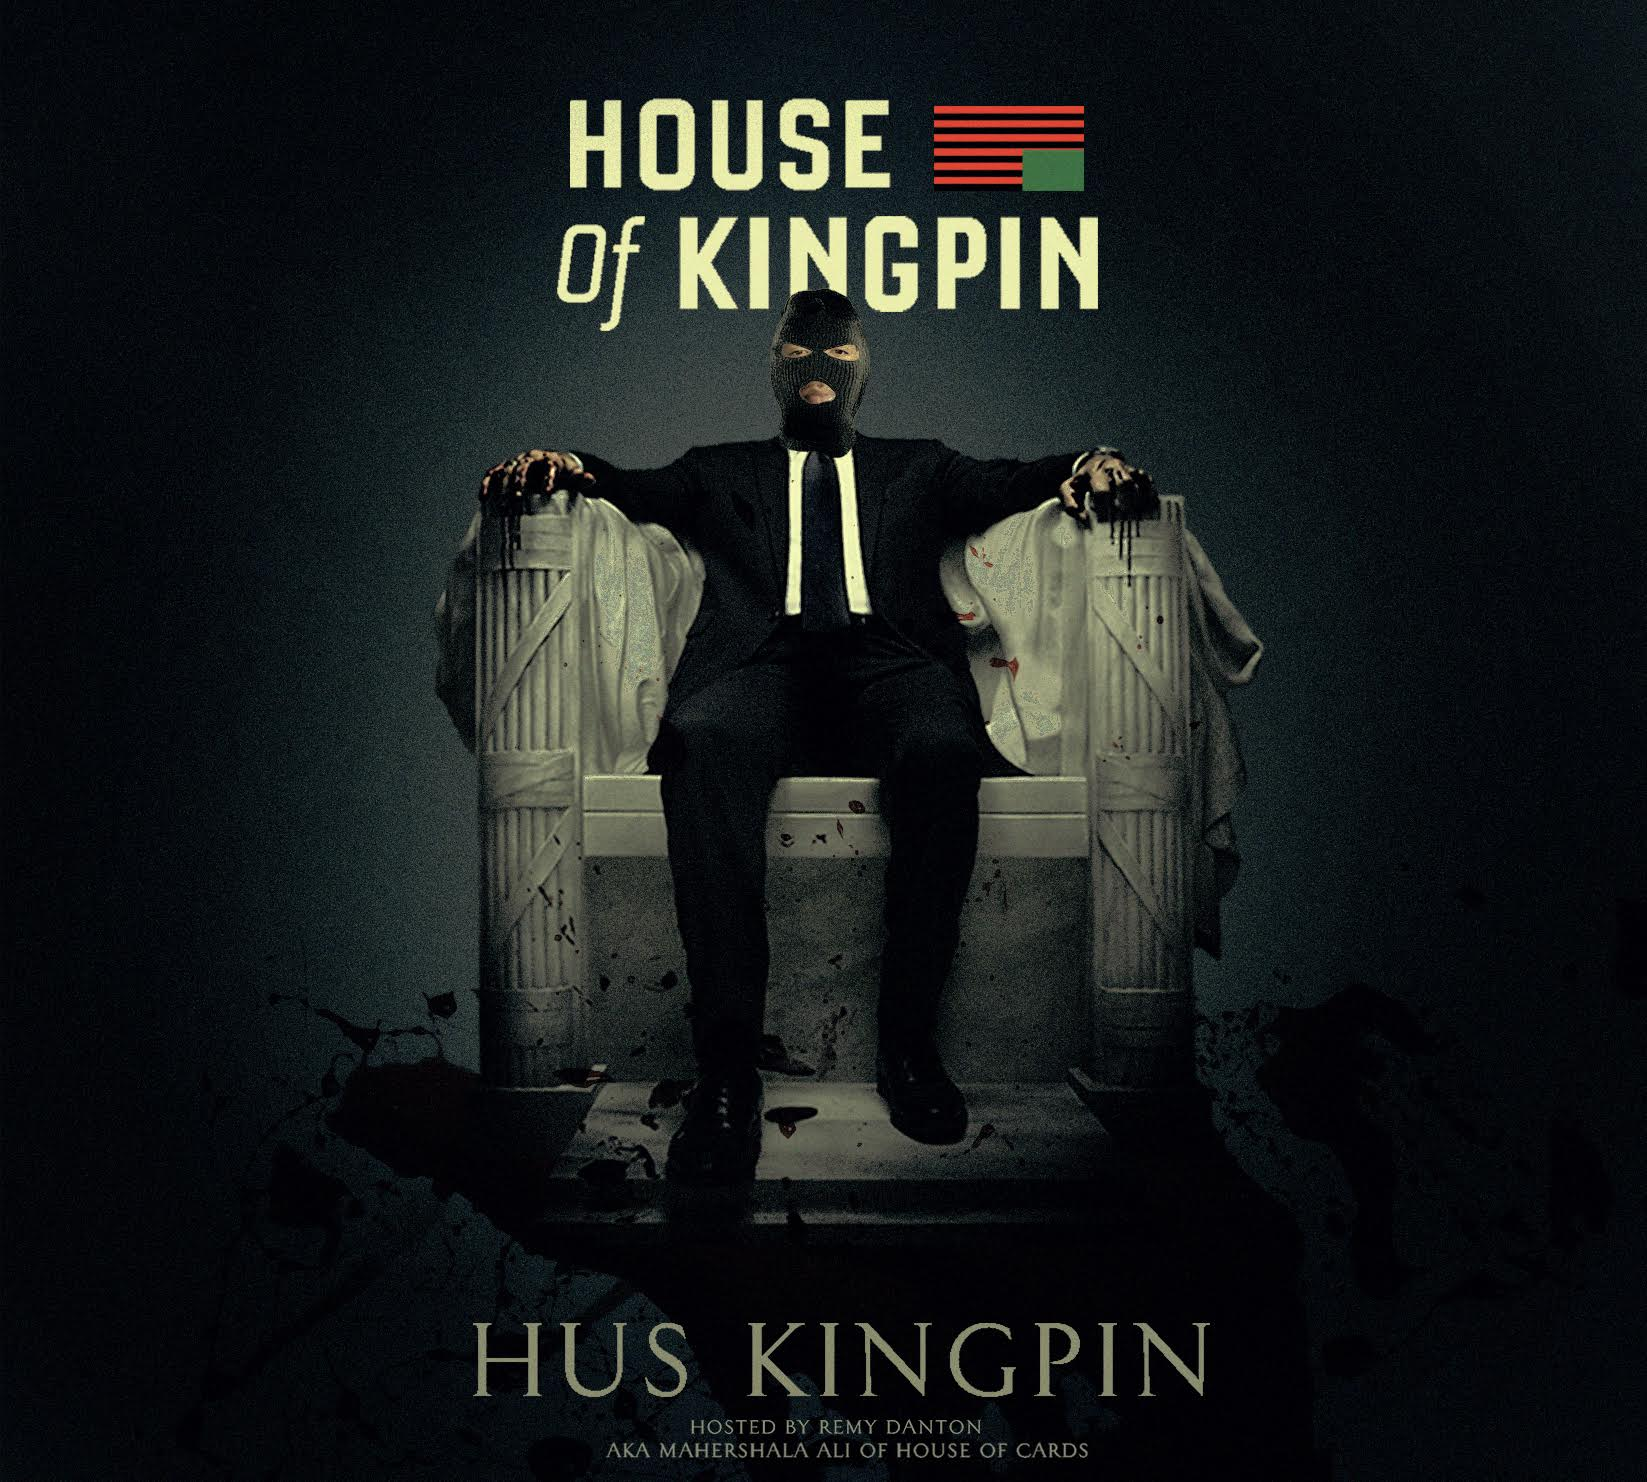 HouseOfKingpin